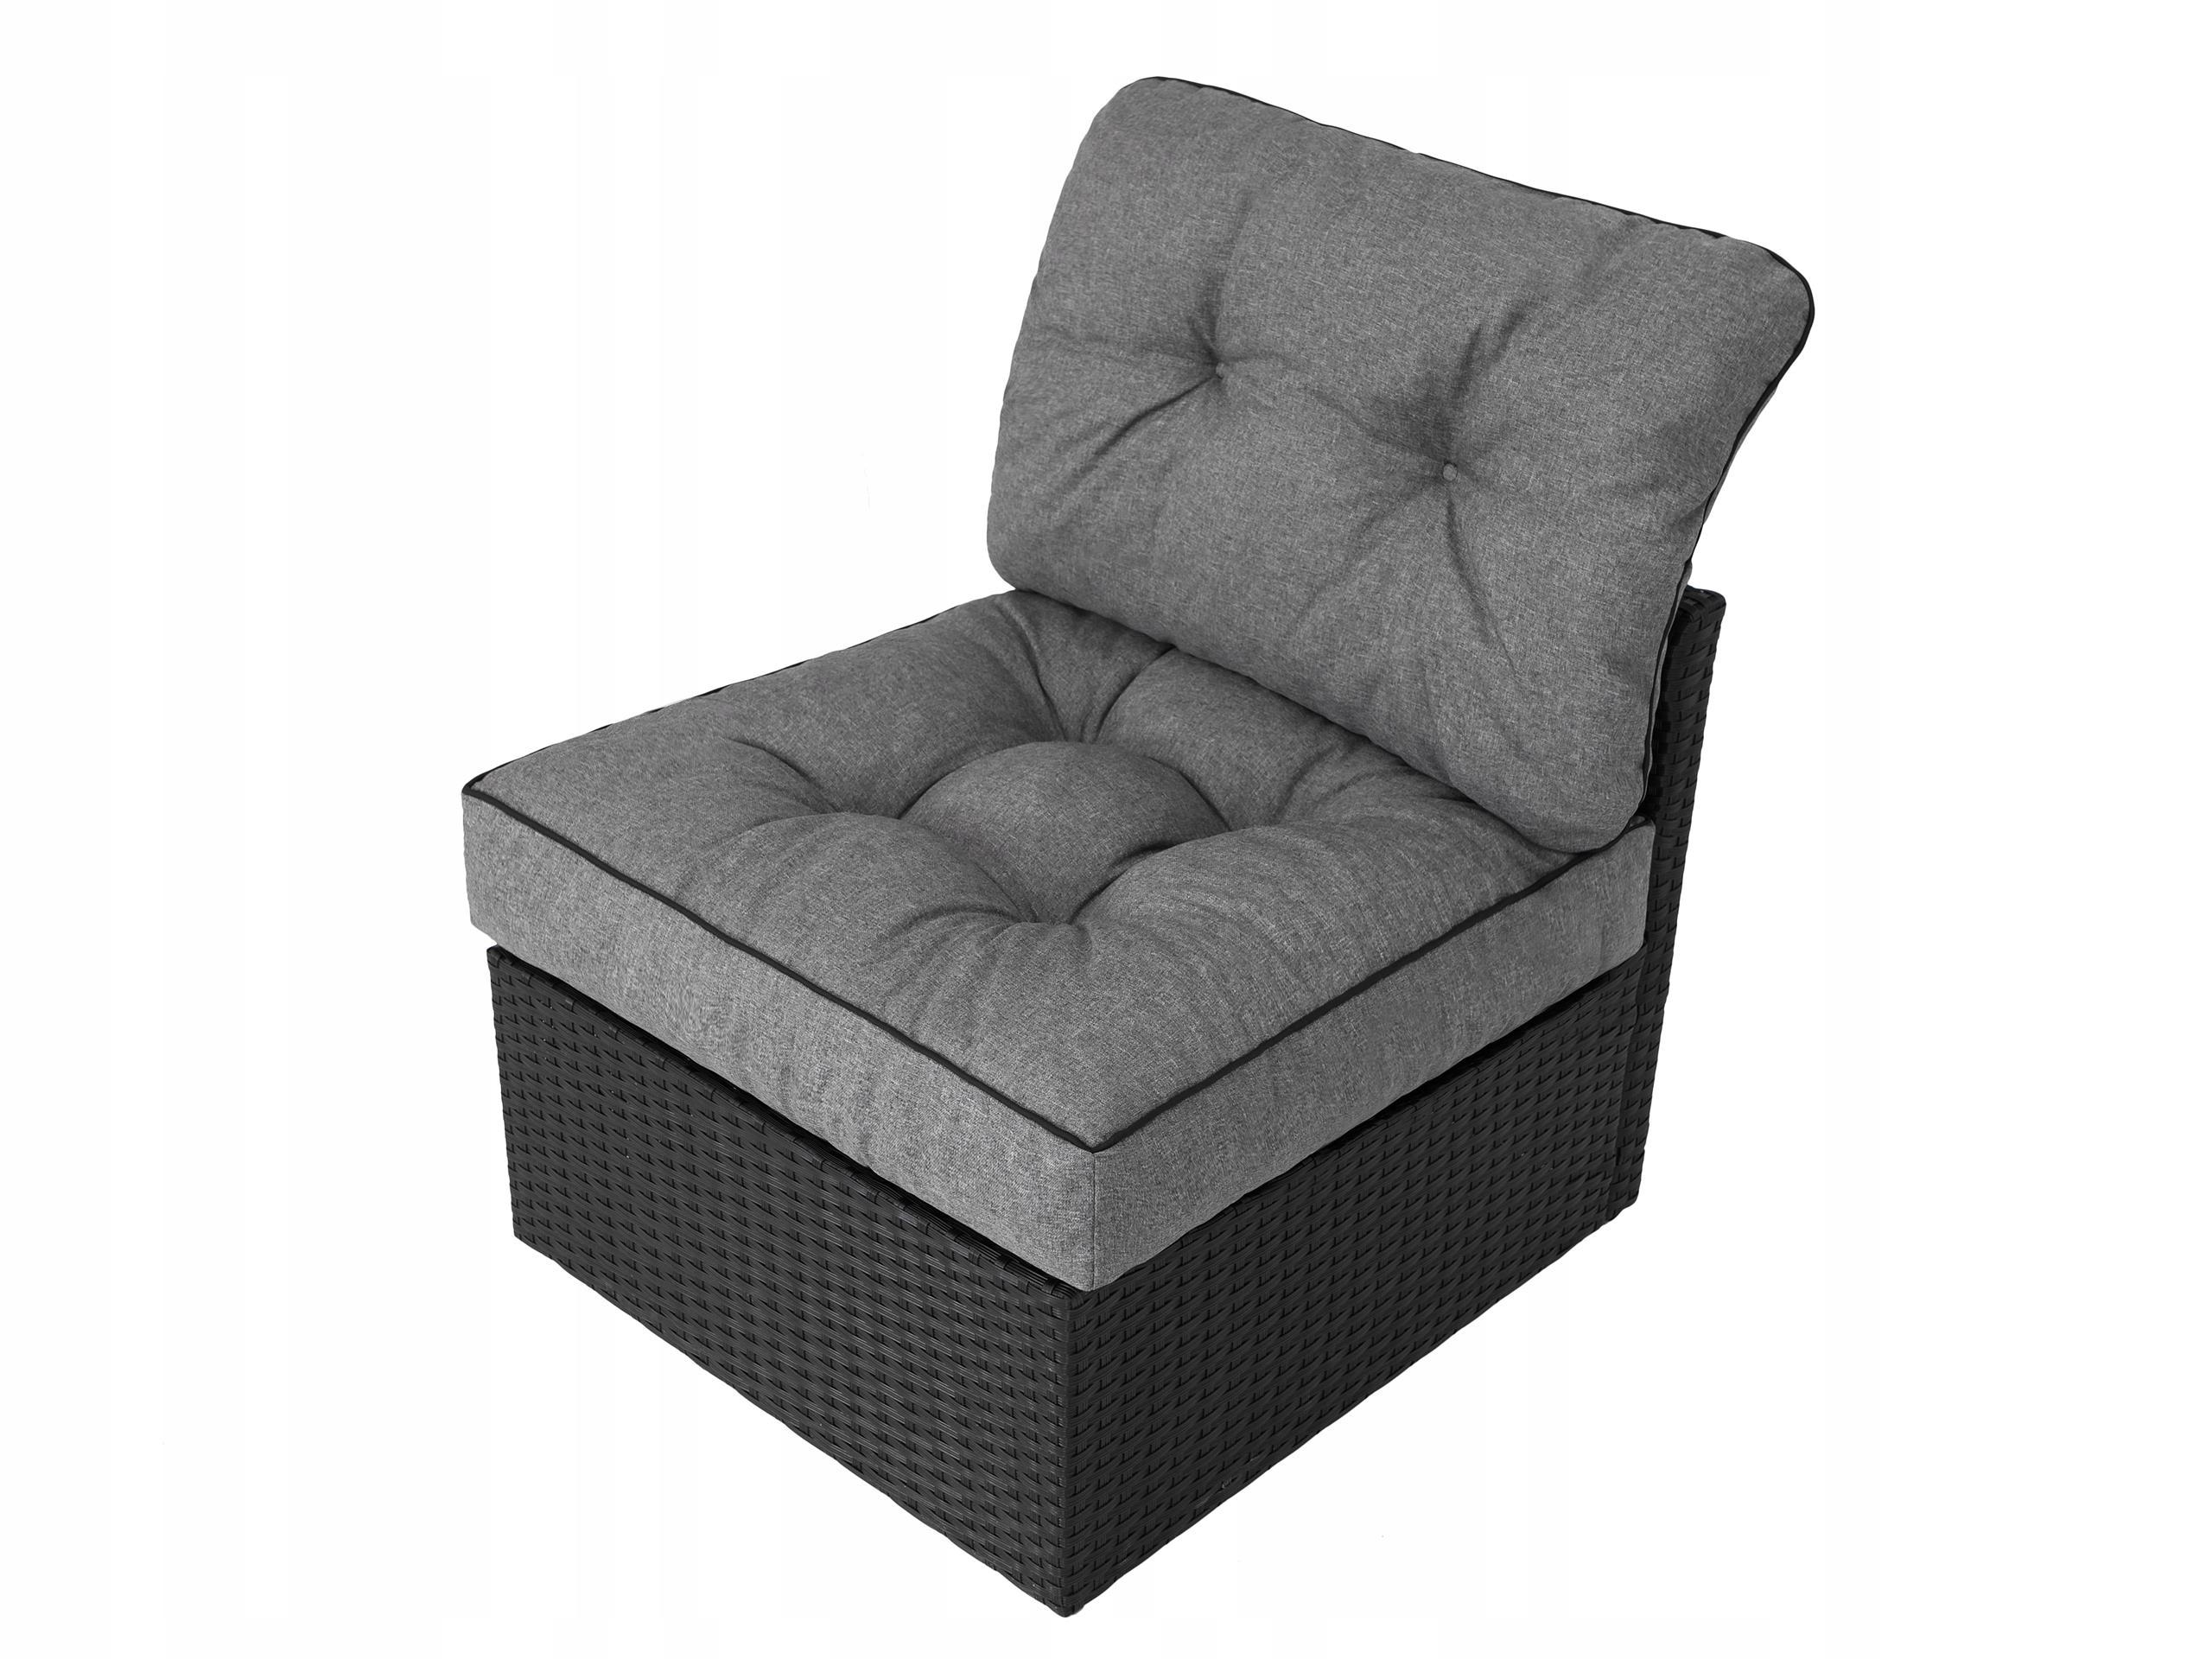 Подушки на кресло, диван technorattan 60x60x40